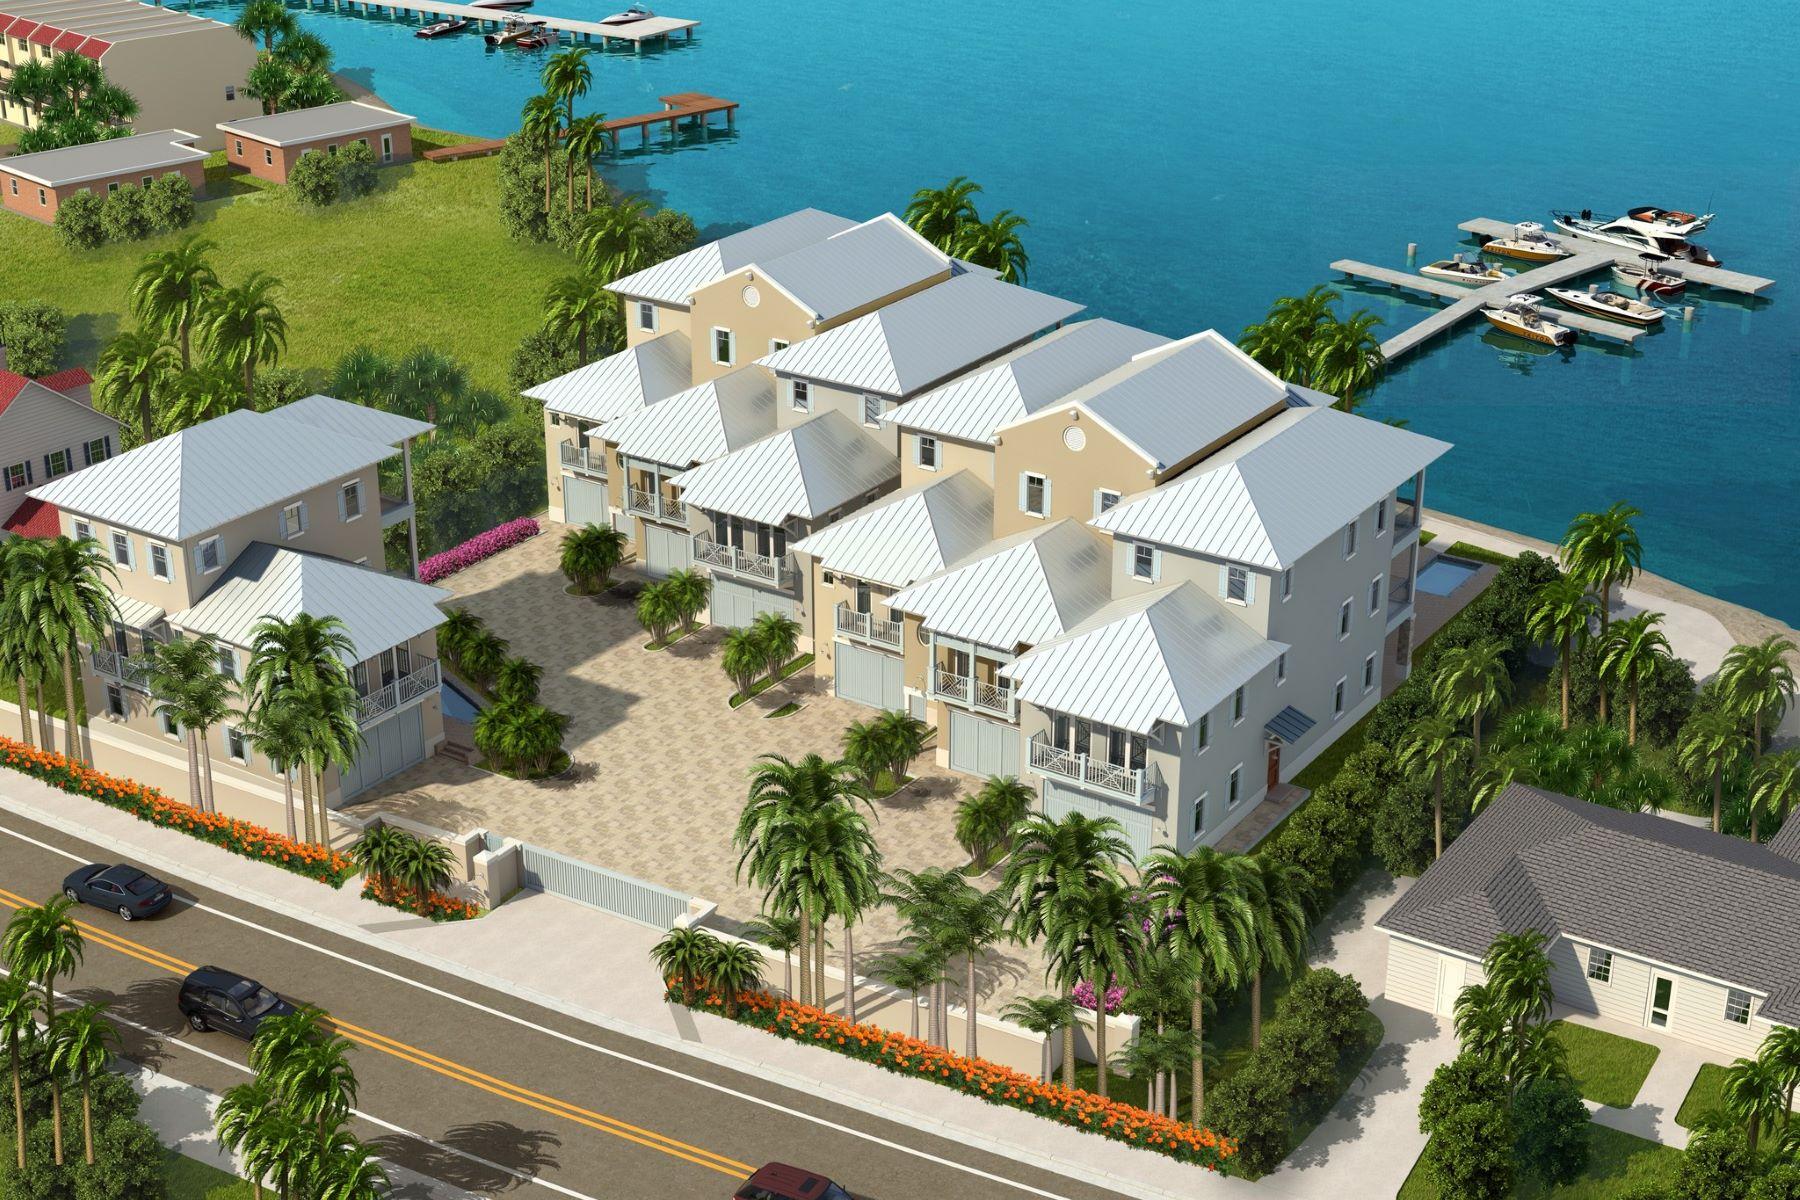 Moradia em banda para Venda às Riverfront Ultra-luxury townhome 1502 Seaway Drive #4 Hutchinson Island, Florida, 34949 Estados Unidos